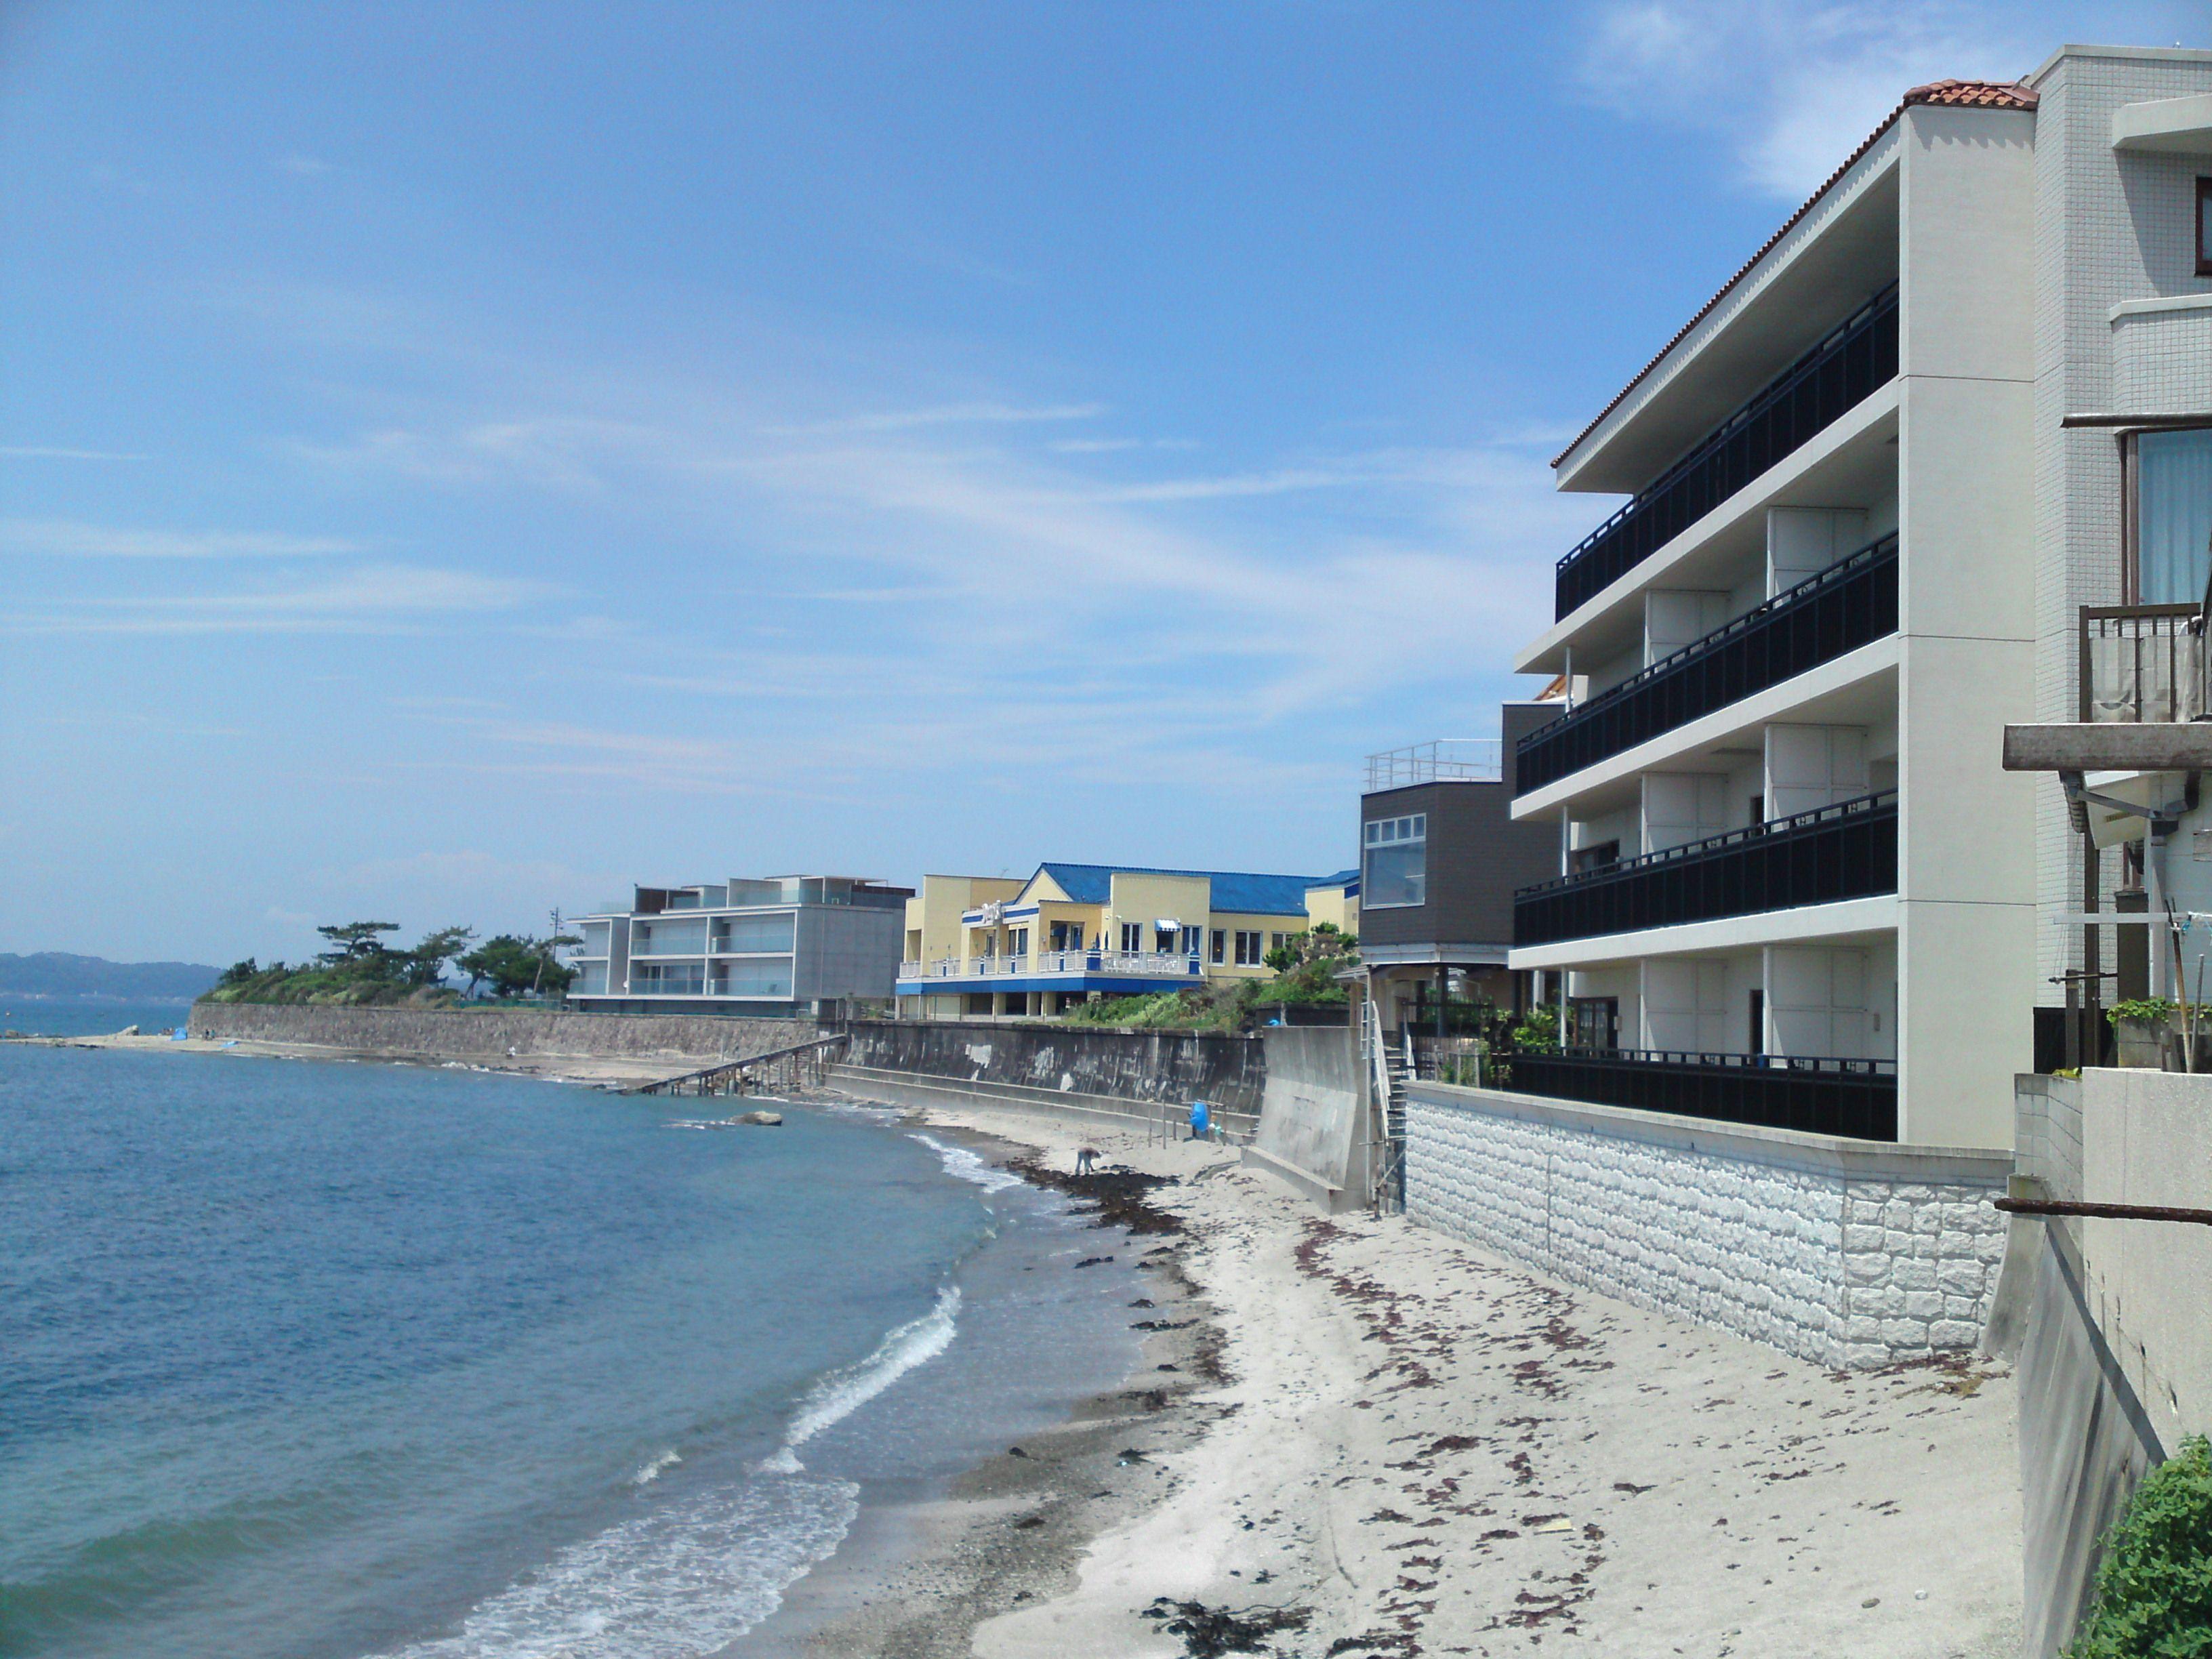 Beach front from Shinnase to Morito.